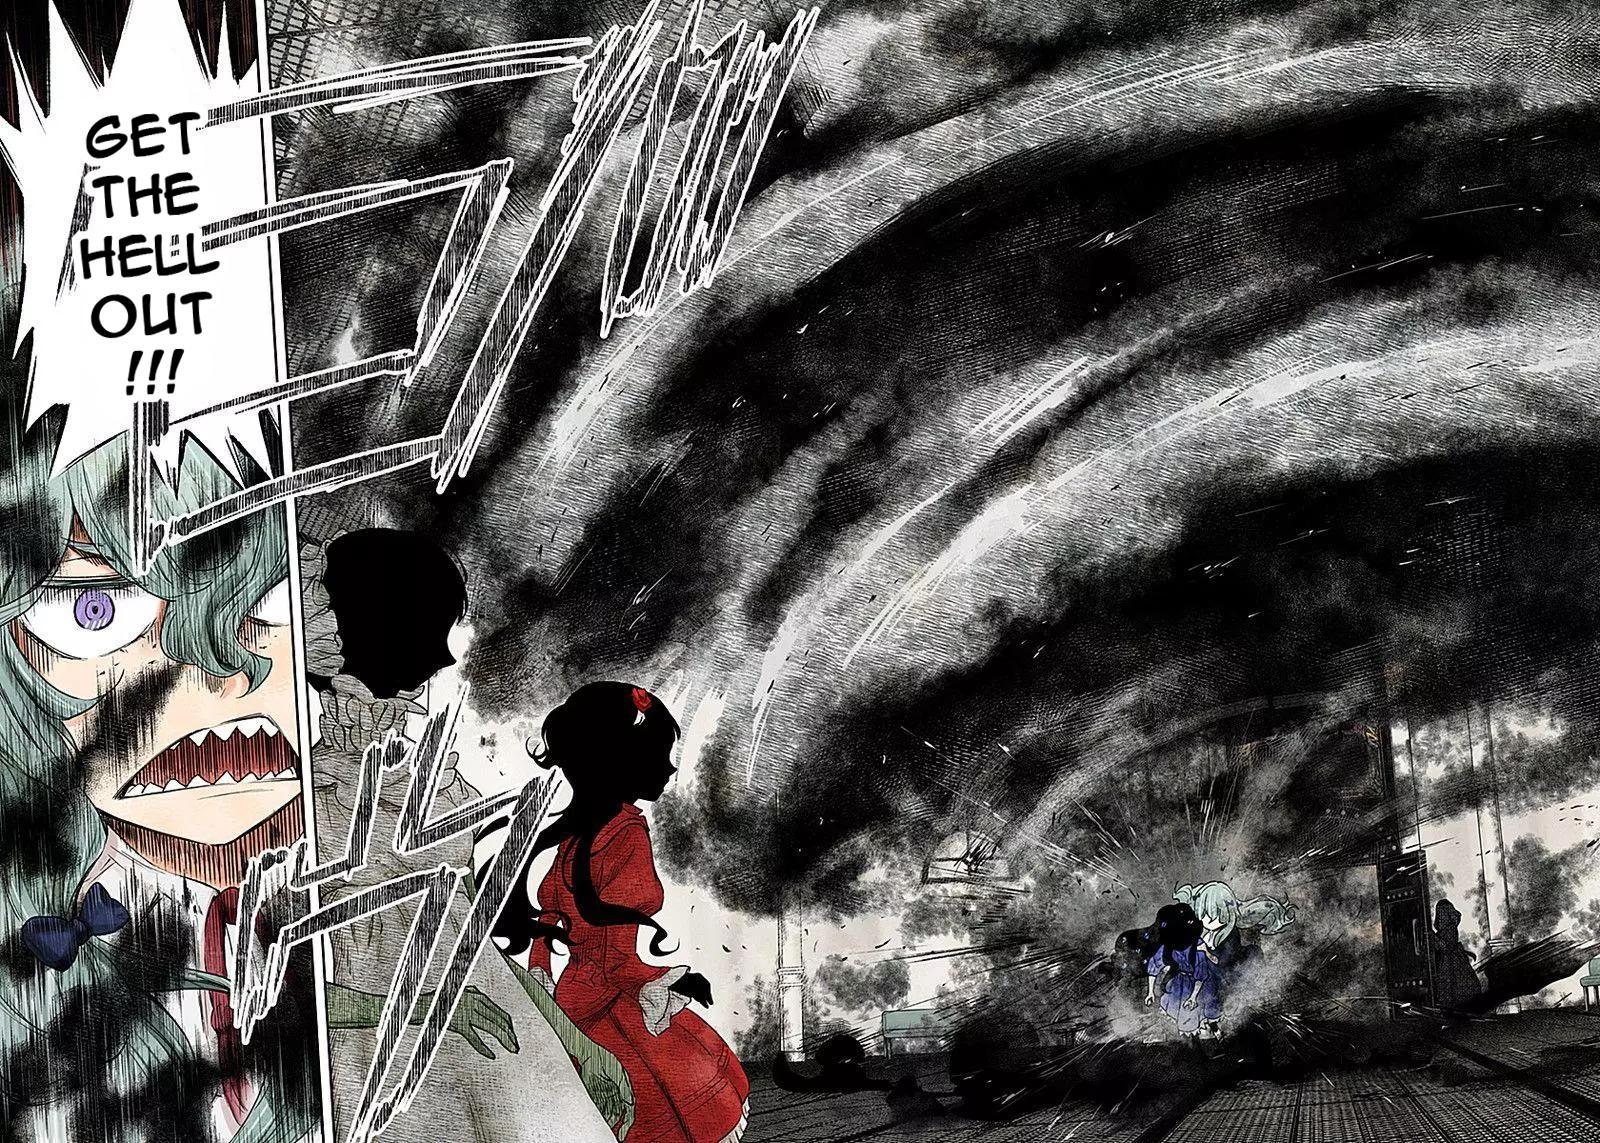 shadows house manga, read shadows house, shadows house, shadows house anime, mangadex shadow house, shadows house raw, shadows house mal, shadows house trailer, shadows house wiki, shadow house fortnite, shadows house anime release date, shadows house chapter 1, dark shadows house, what we do in the shadows house, dark shadows house kennebunkport maine, dark shadows house location, what we do in the shadows house location, dark shadows house by the sea, dark shadows house newport ri, dark shadows house interior, what we do in the shadows house toronto, shadow safe house, shadows safe house fortnite, shadows of fear haunted house, shadows haunted house, shadows awakening thole house cellar well, shadows of brimstone house rules, shadows j hip this house, shadows red house painters, shadows house mangadex, shadows house kate, shadows house read online, shadows house characters, shadows house plot, shadows house anime where to watch, the shadows house in louisiana, the shadows house, the shadows house of rising sun, shadows house anilist, shadows house anime trailer, shadows house anime reddit, shadows house anime planet, shadows house anthony, shadows house ann, shadows house anidb, shadows house baka, shadows house by somato, shadows house book, shadows guest house bothaville, shadows j hip this house break, shadows house chapter 89, shadows house chapters, shadows house chapter 81, shadows house crunchyroll, shadows house chapter 48, shadows house chapter 25, shadows house chapter 85, shadows house chapter 69, shadows house discord, dark shadows house floor plan, dark shadows house for sale, shadows house episode 1, shadows house ending, shadows house ed, shadows house emily, shadows house english, shadows house english manga, shadows house ep 1, ozark shadows exterior house, shadows house funimation, shadows house fandom, shadows house manga free, mountain shadows house for sale, dark shadows house filmed, shadows of slaughterhouse five, dark shadows old house floo